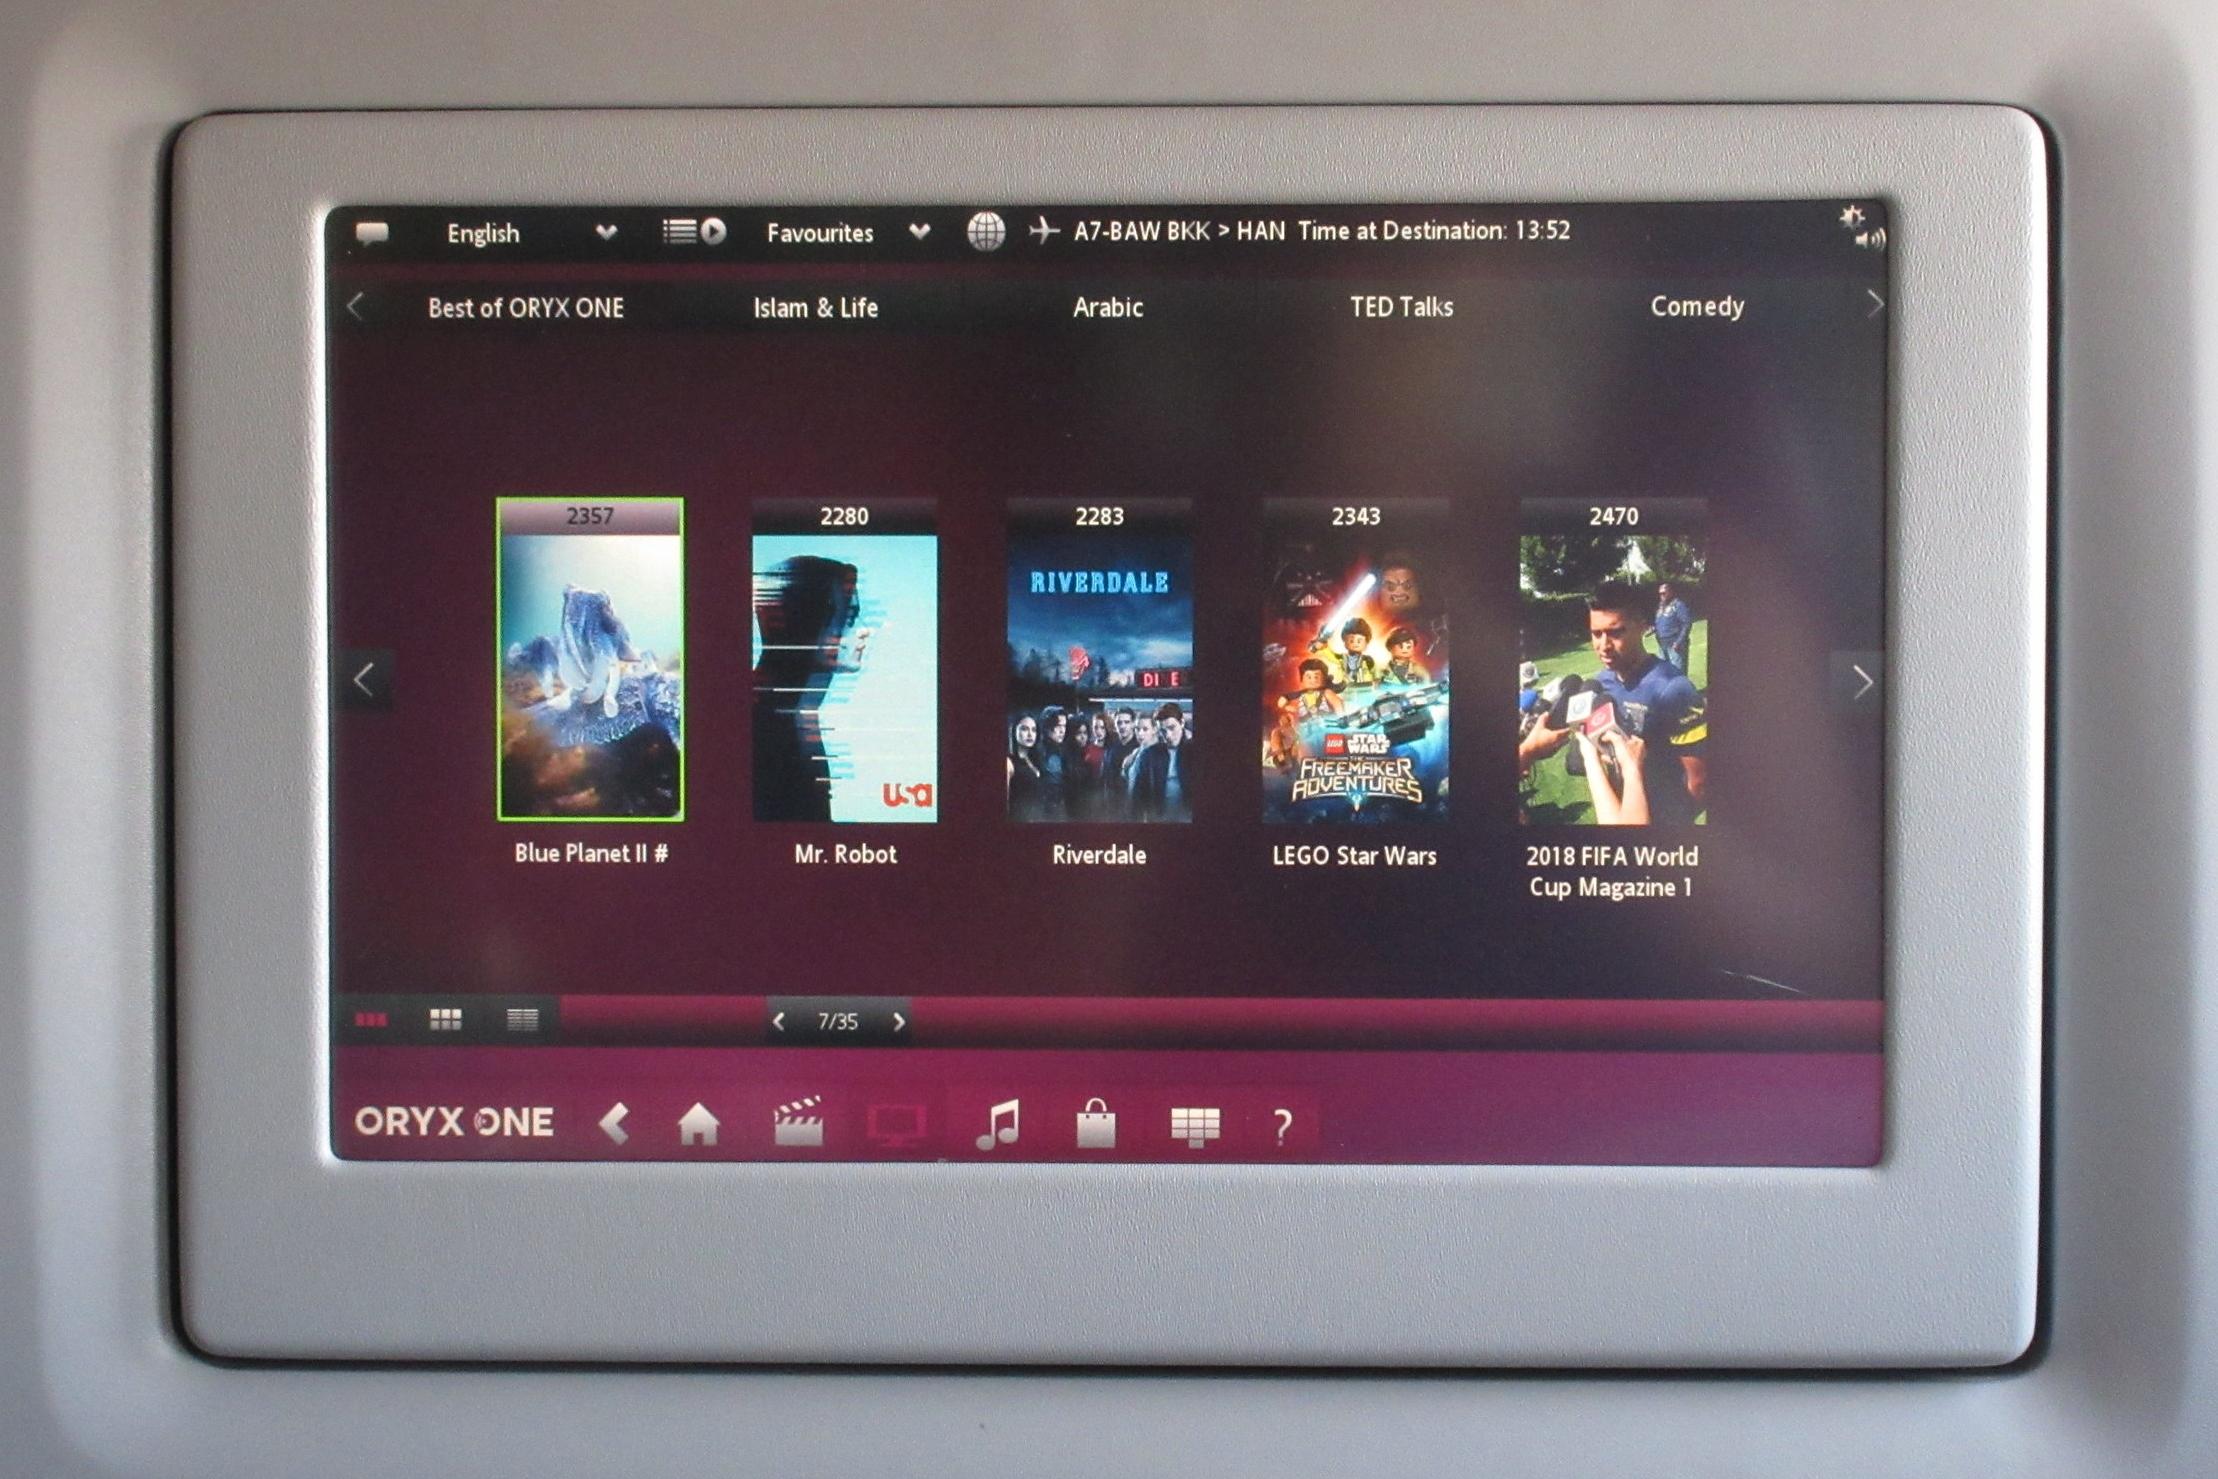 Qatar Airways 777 business class – TV selection